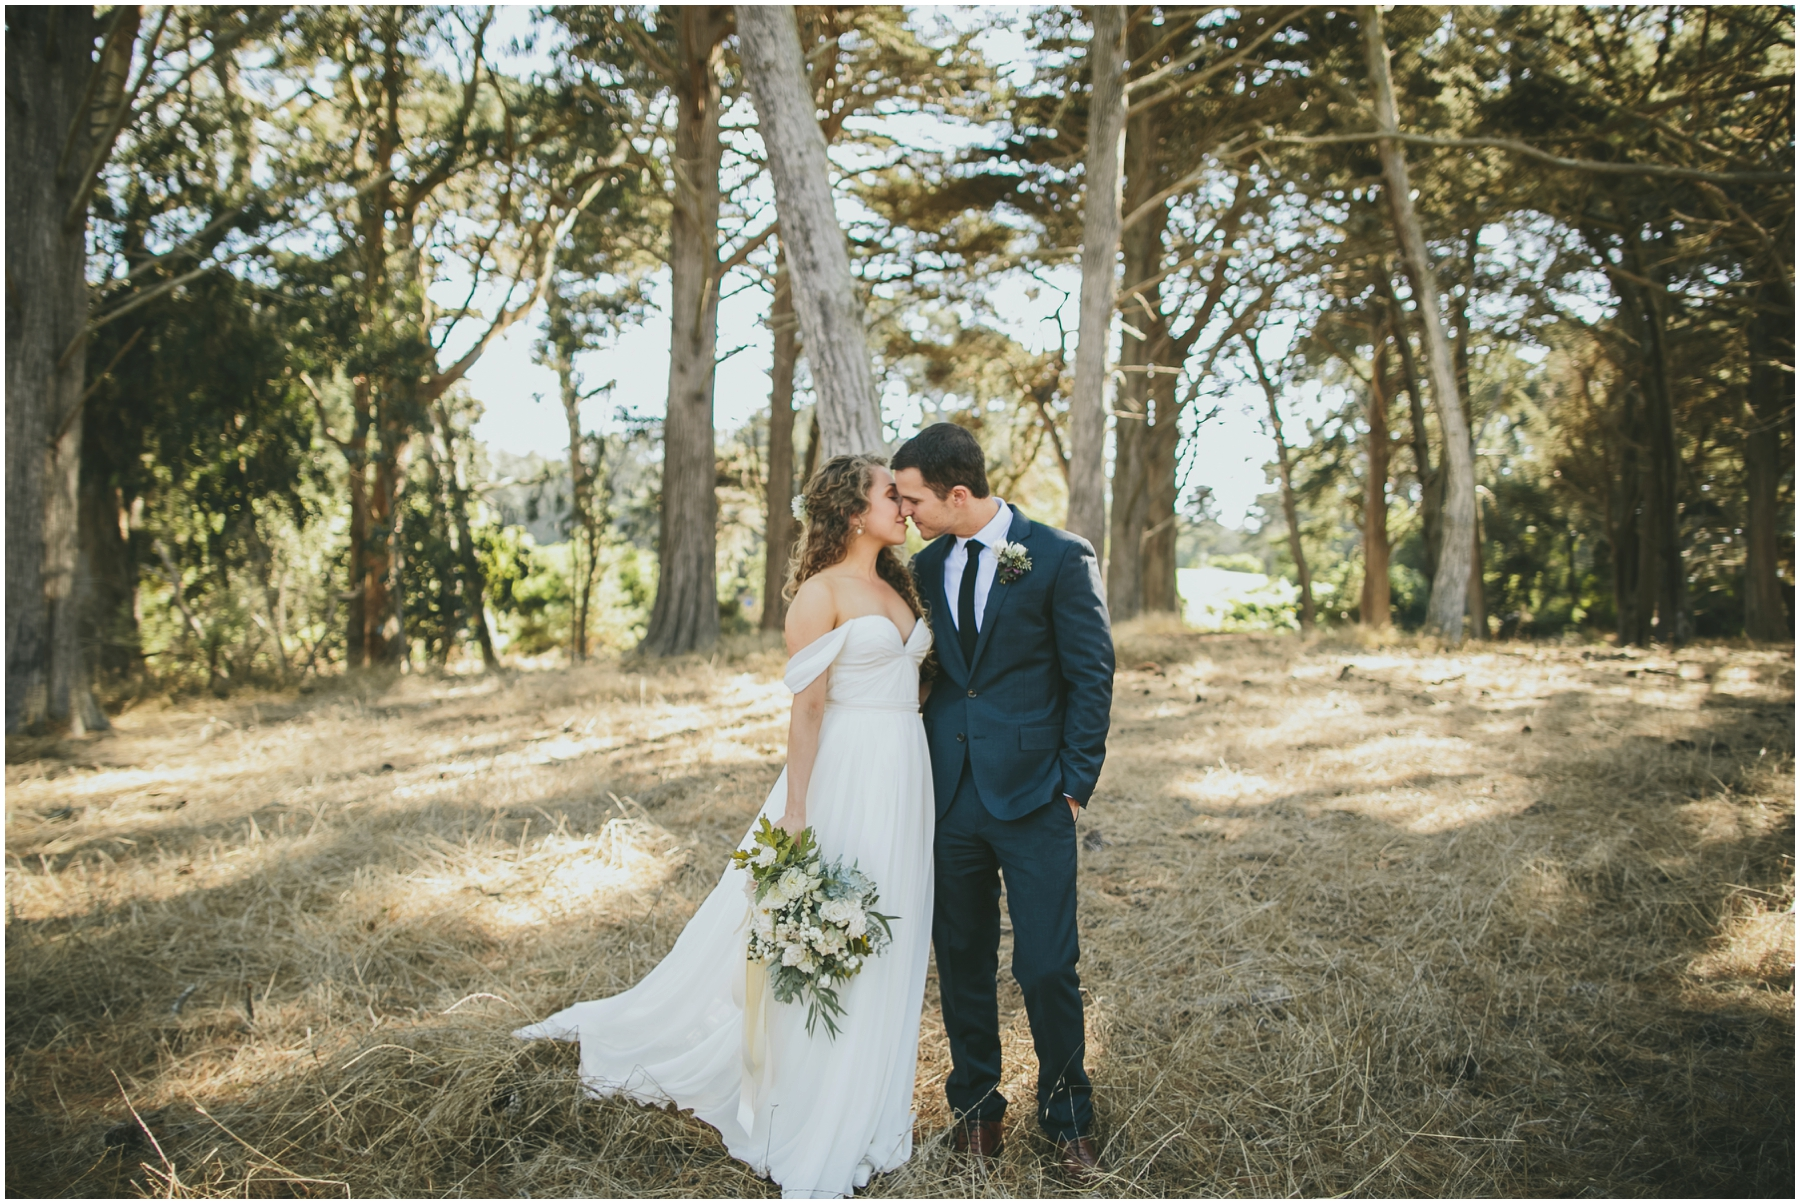 Emily+Paul-WEDDING_KellyBoitanoPhotography_0001